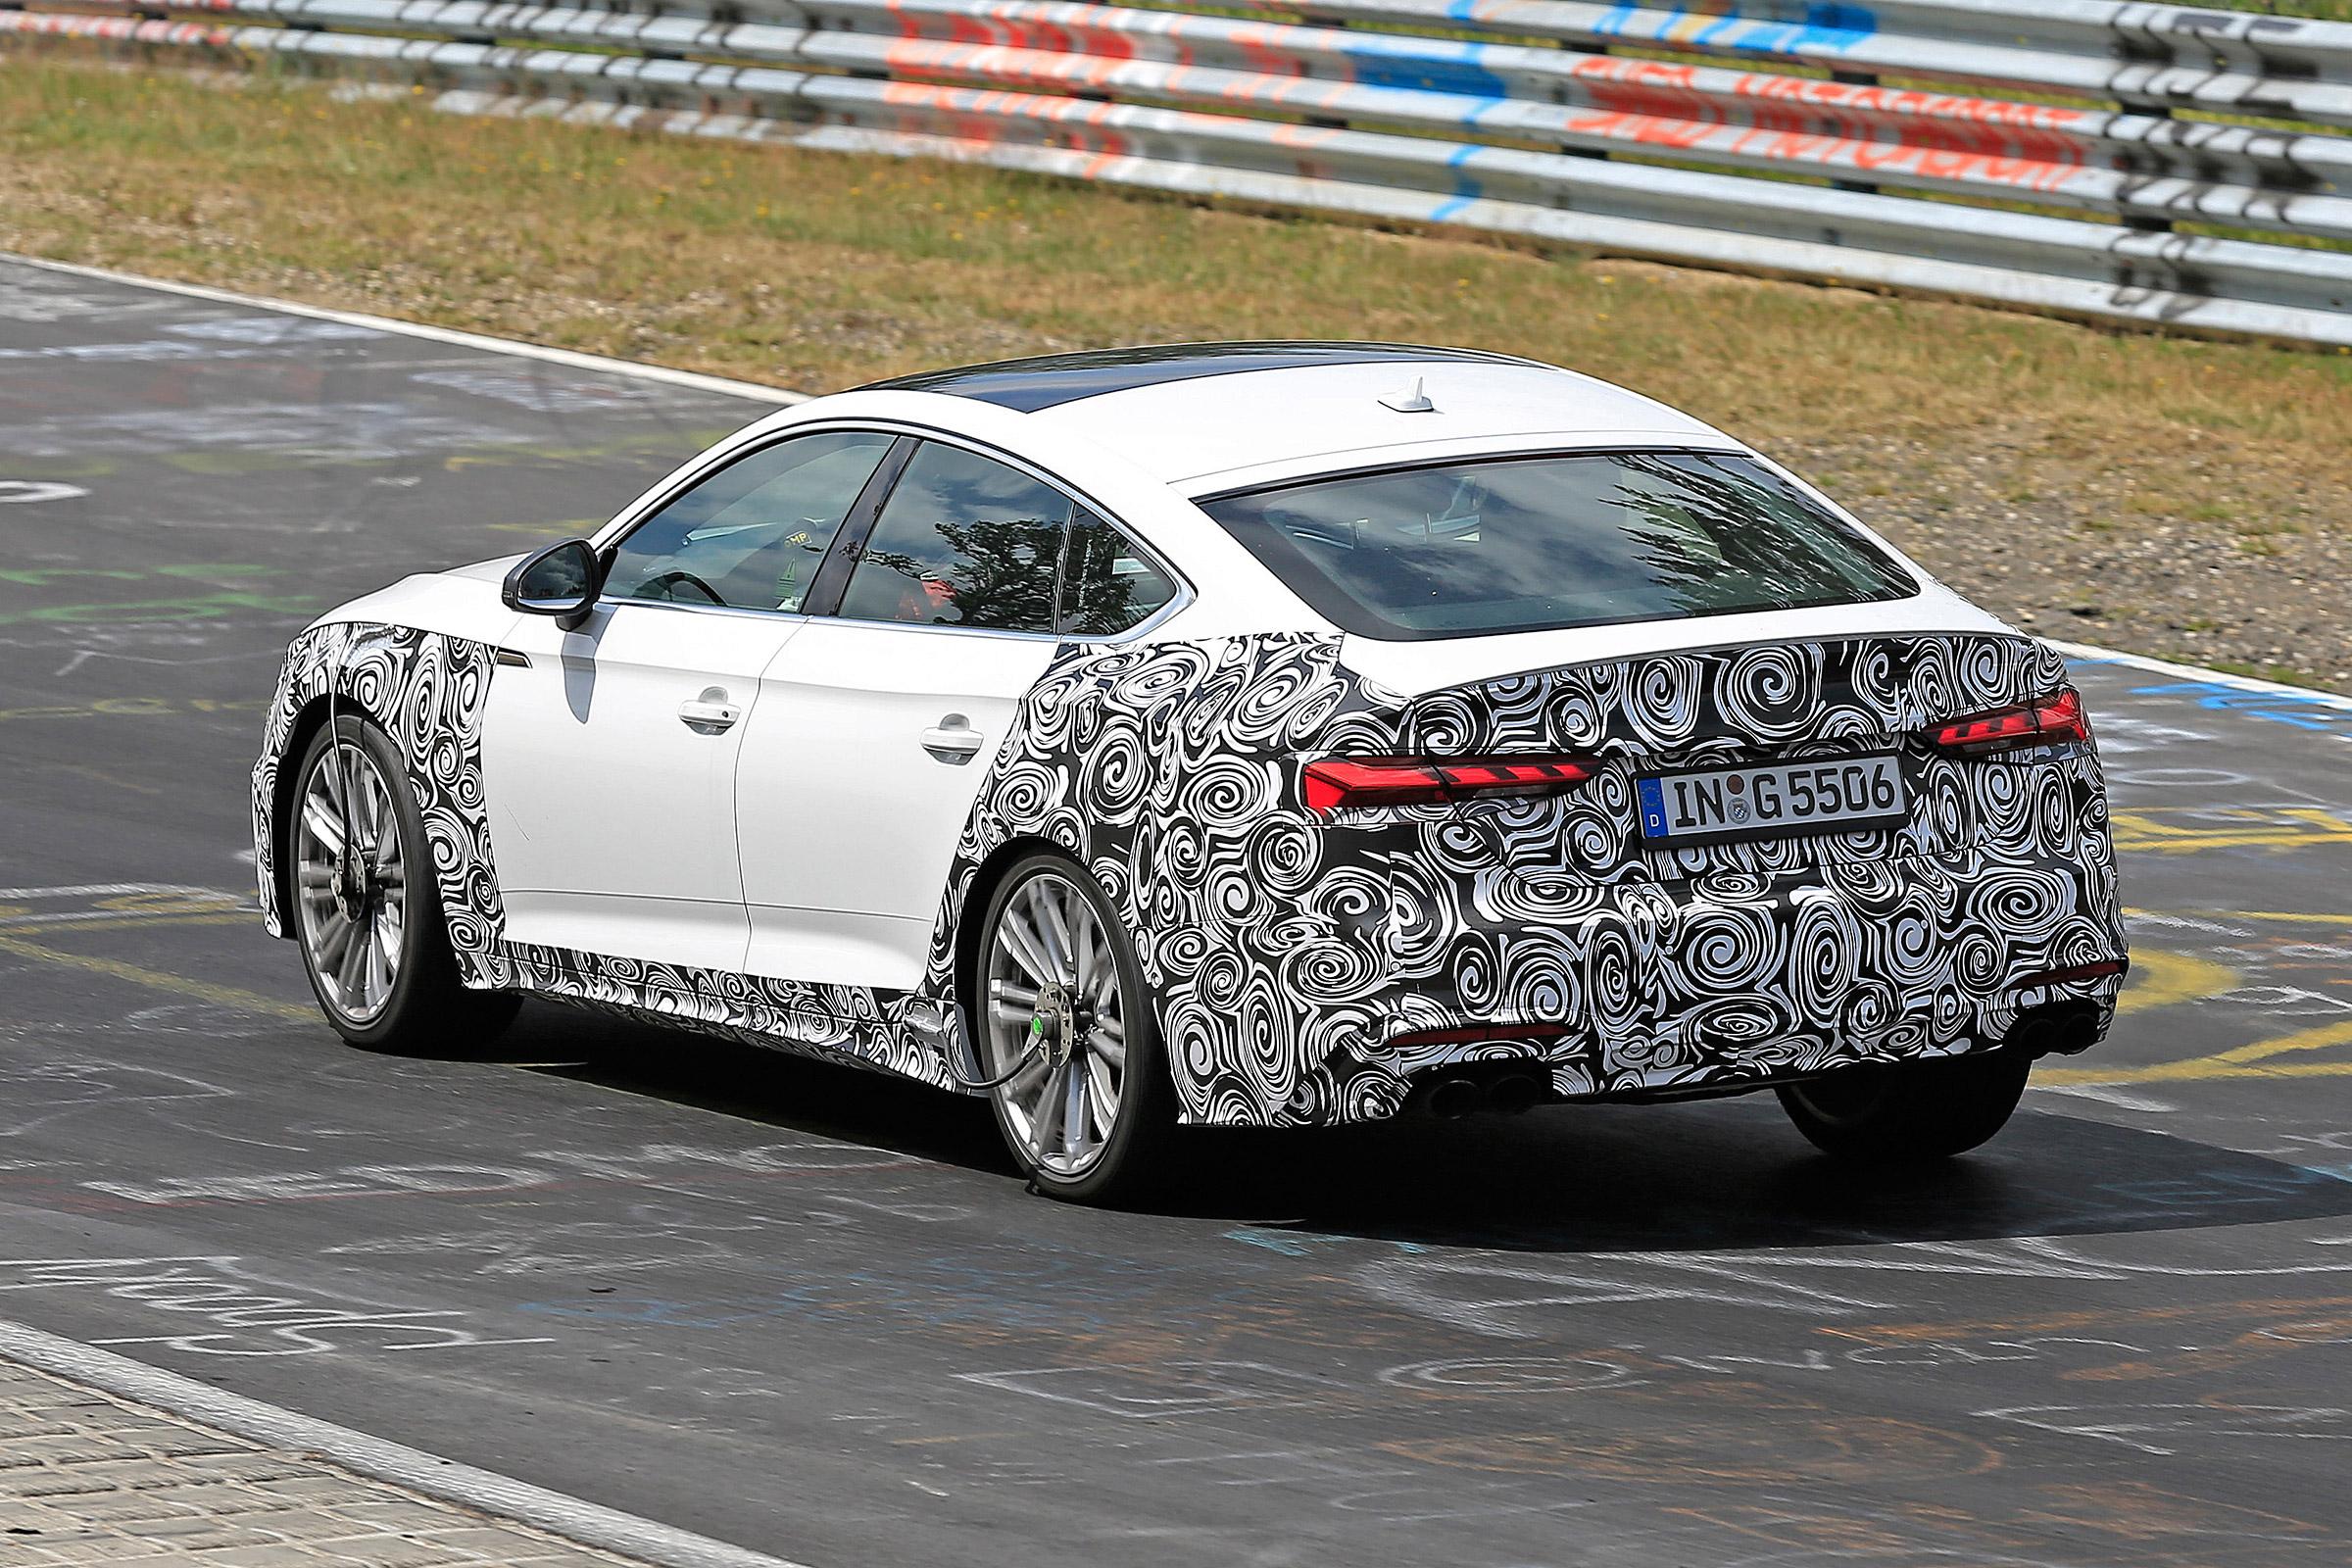 2020 Audi S5 Facelift Spied Before Reveal Alongside Rest Of